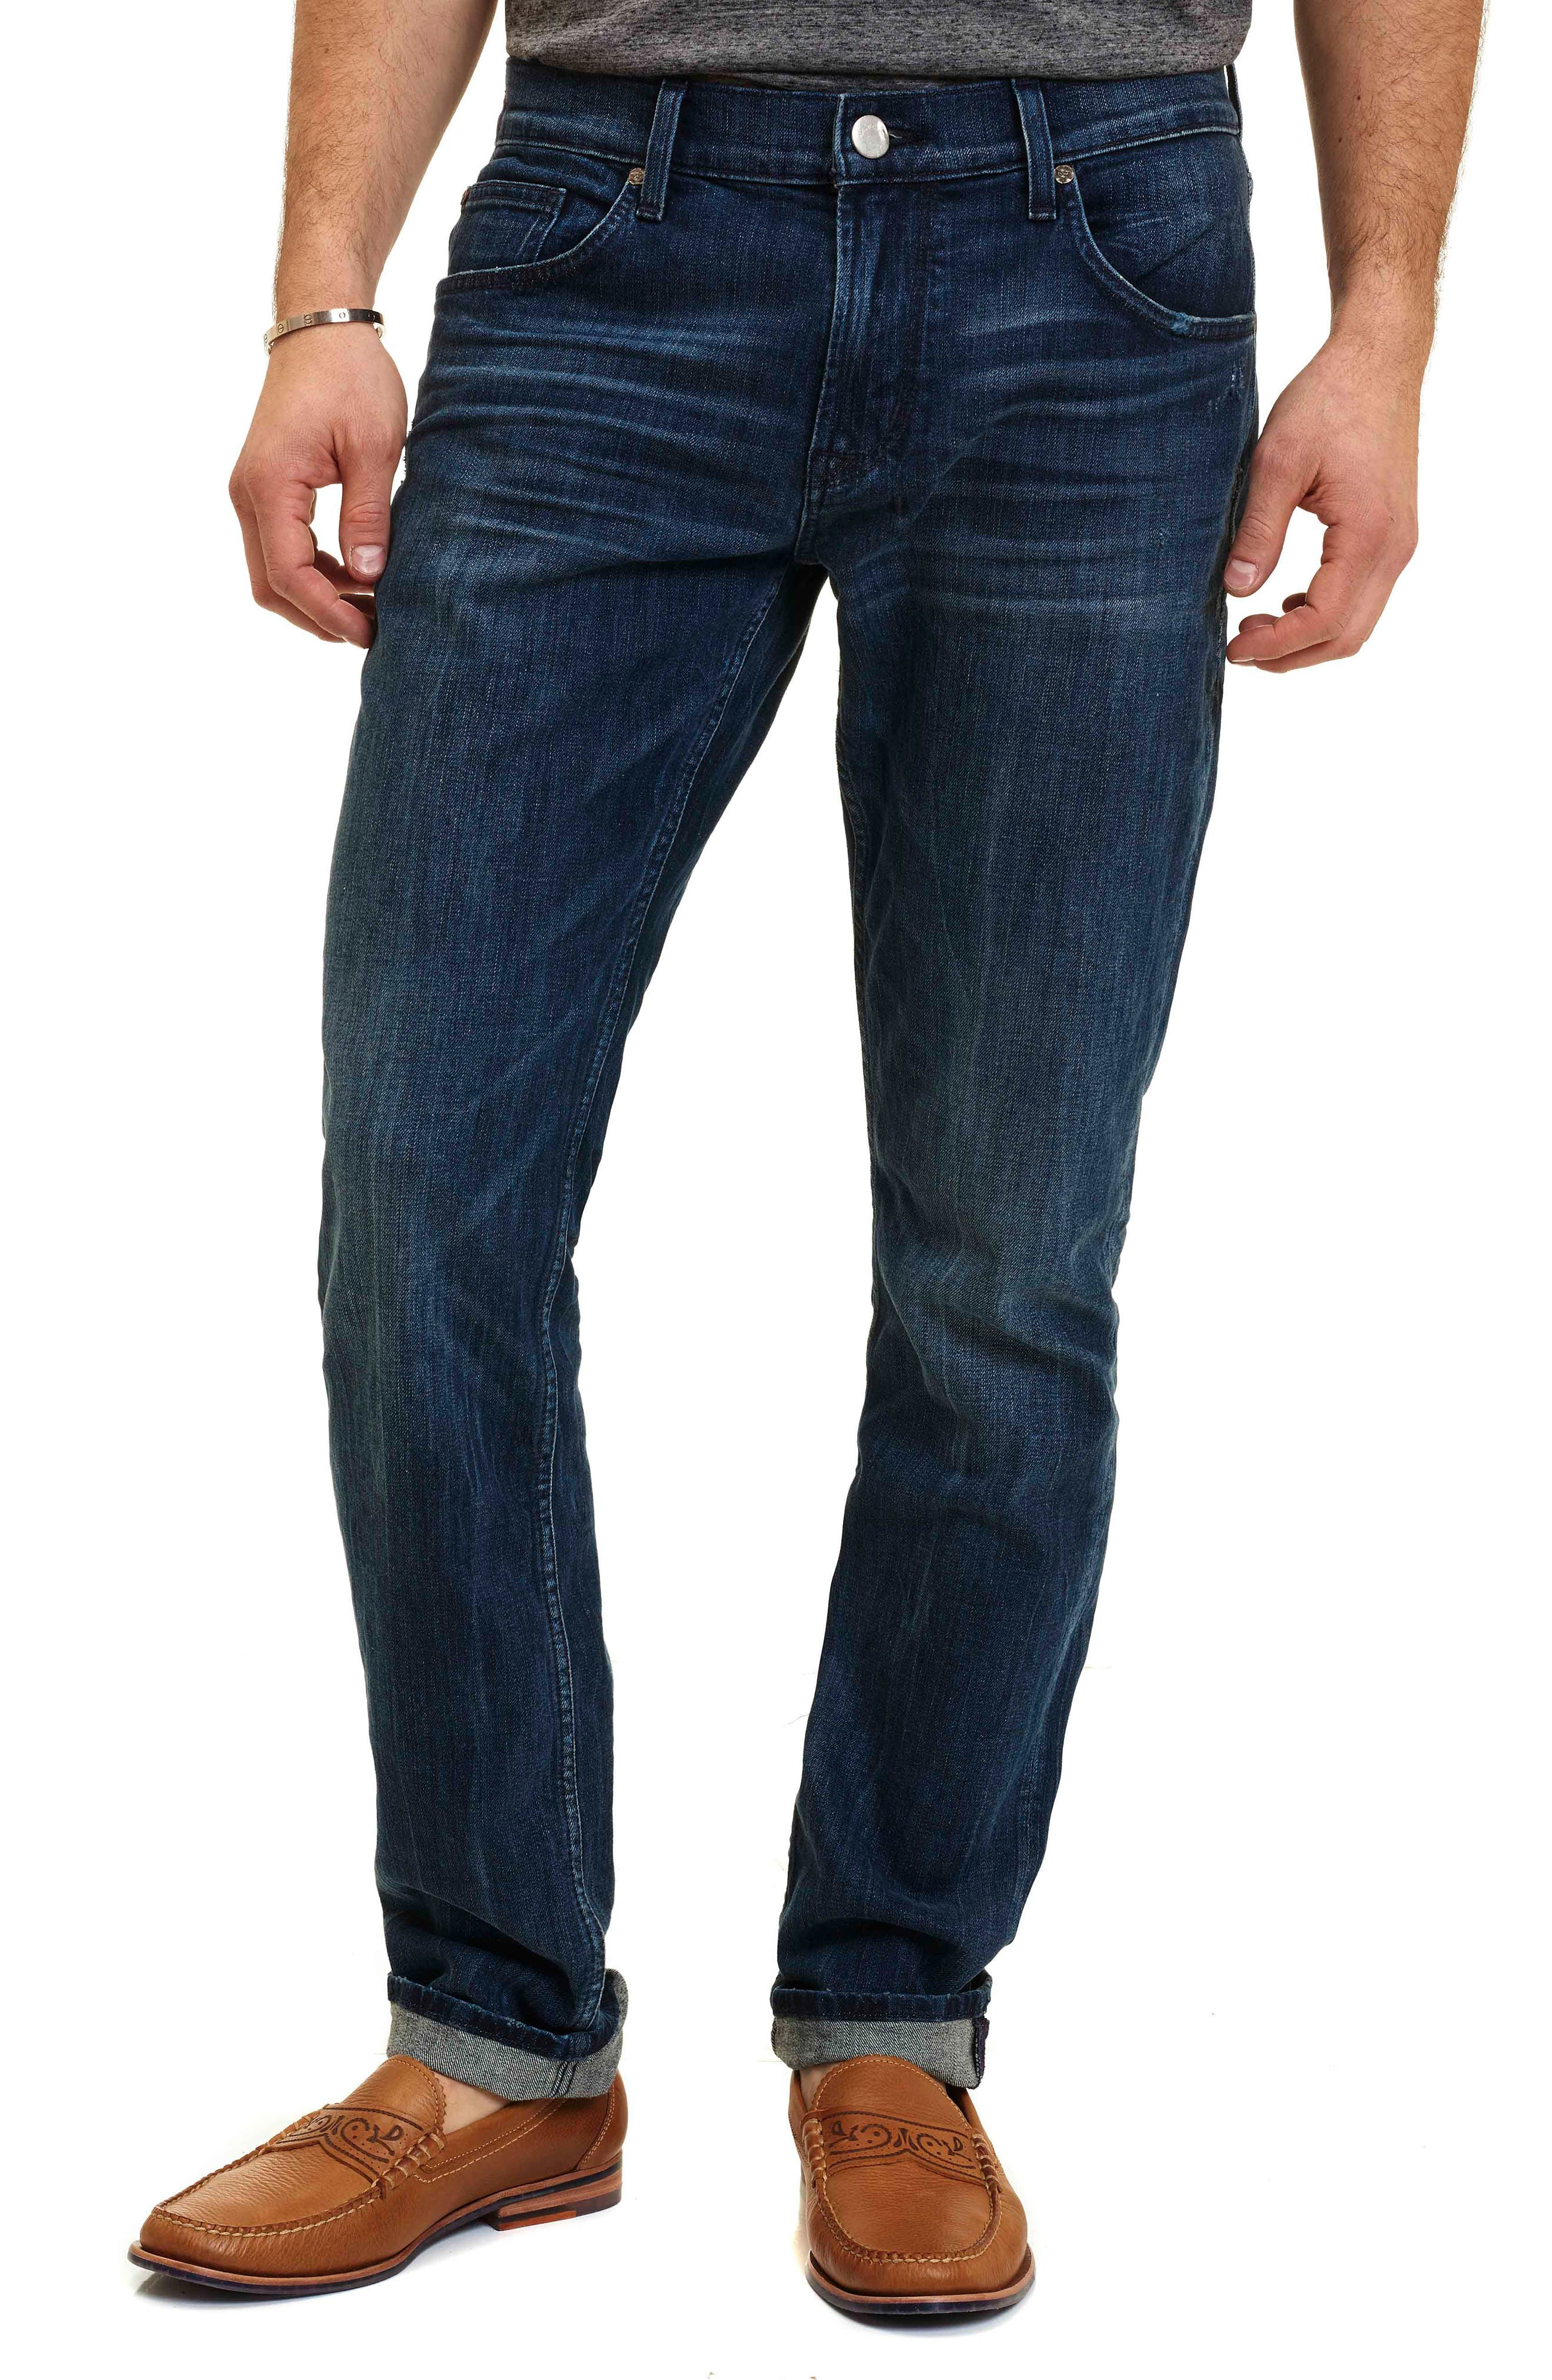 Robert Graham Activate Tailored Fit Jeans (Indigo)